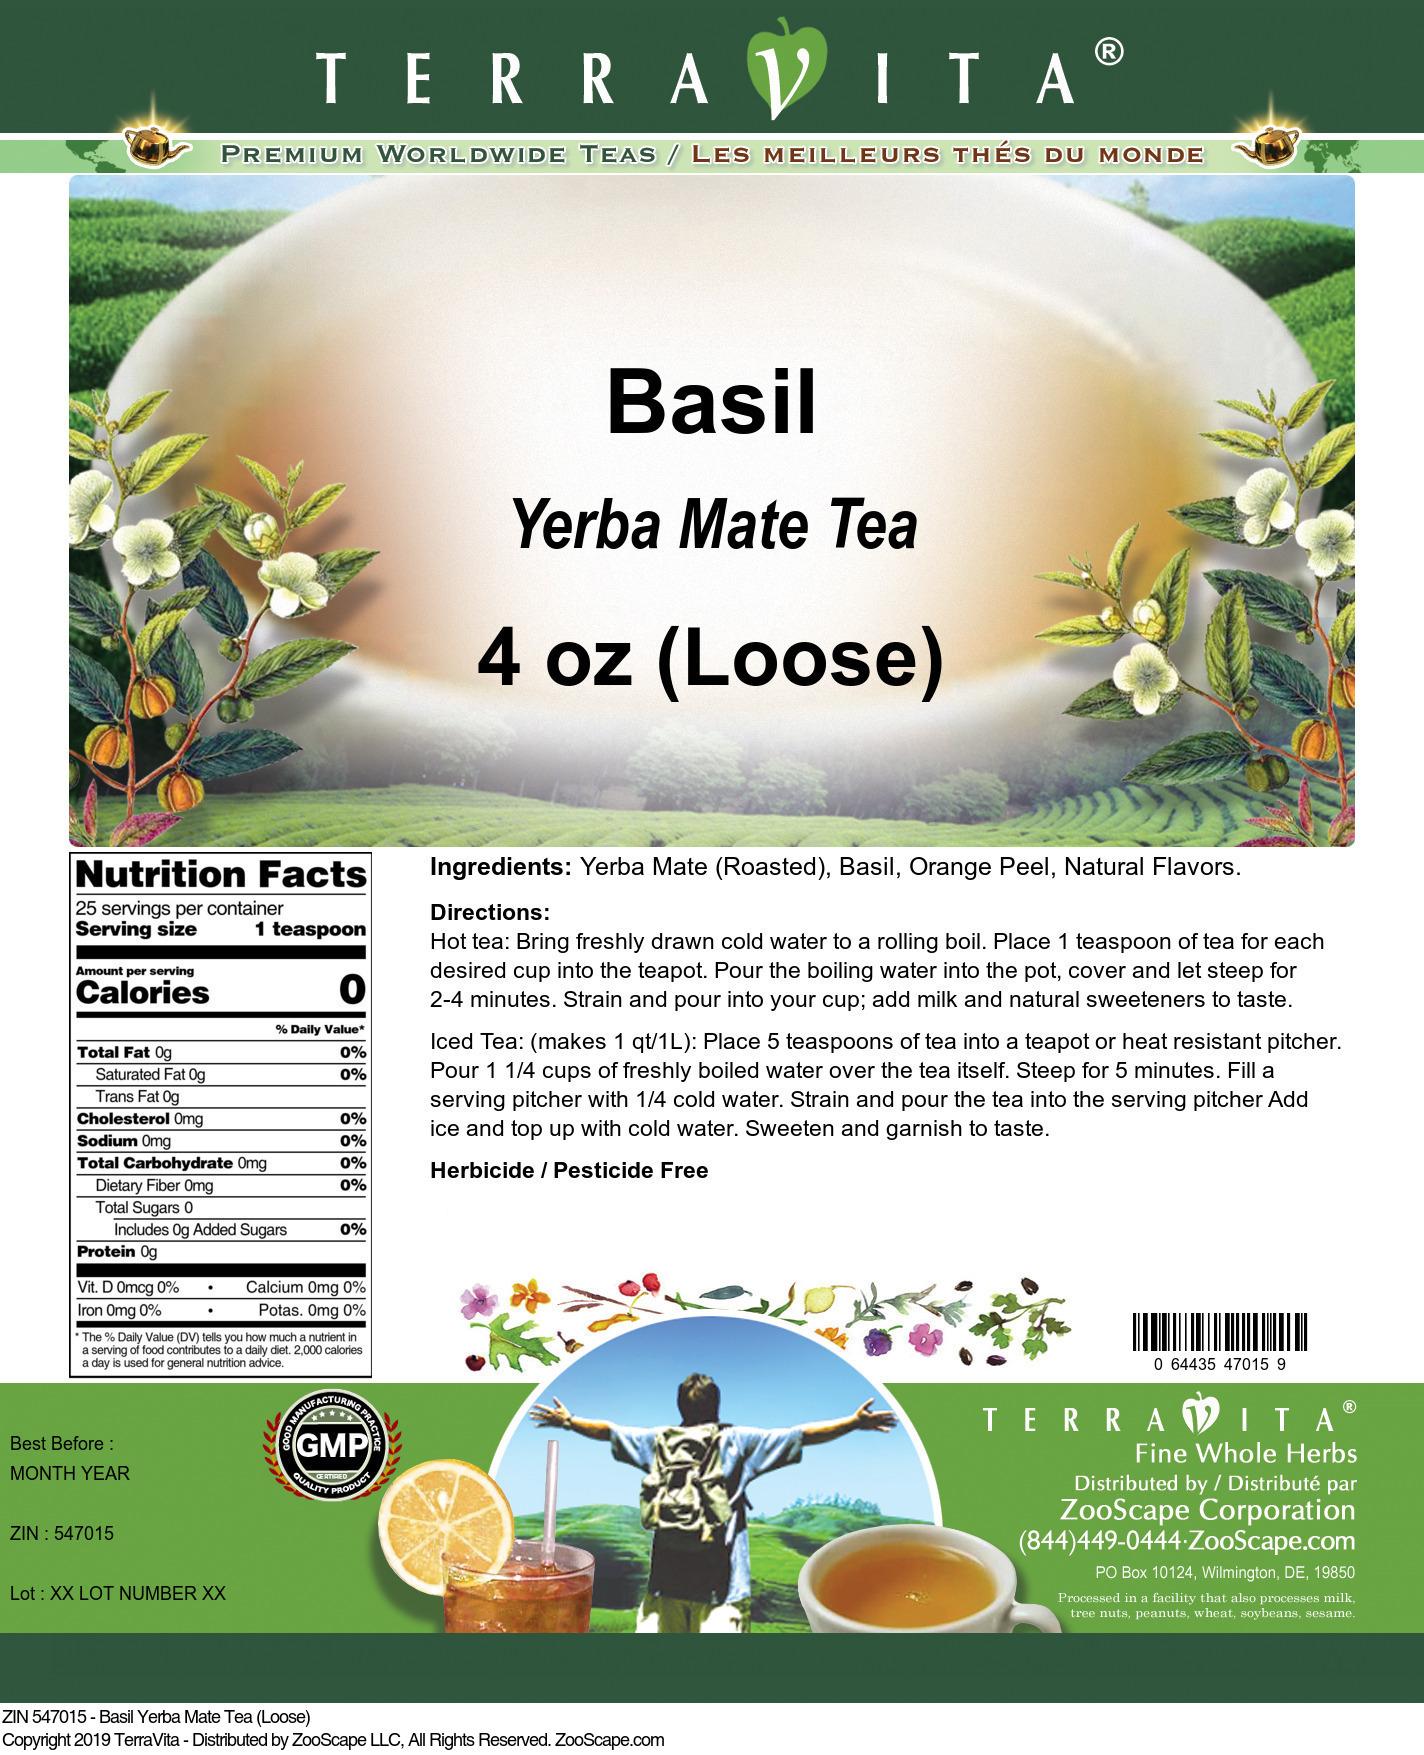 Basil Yerba Mate Tea (Loose)